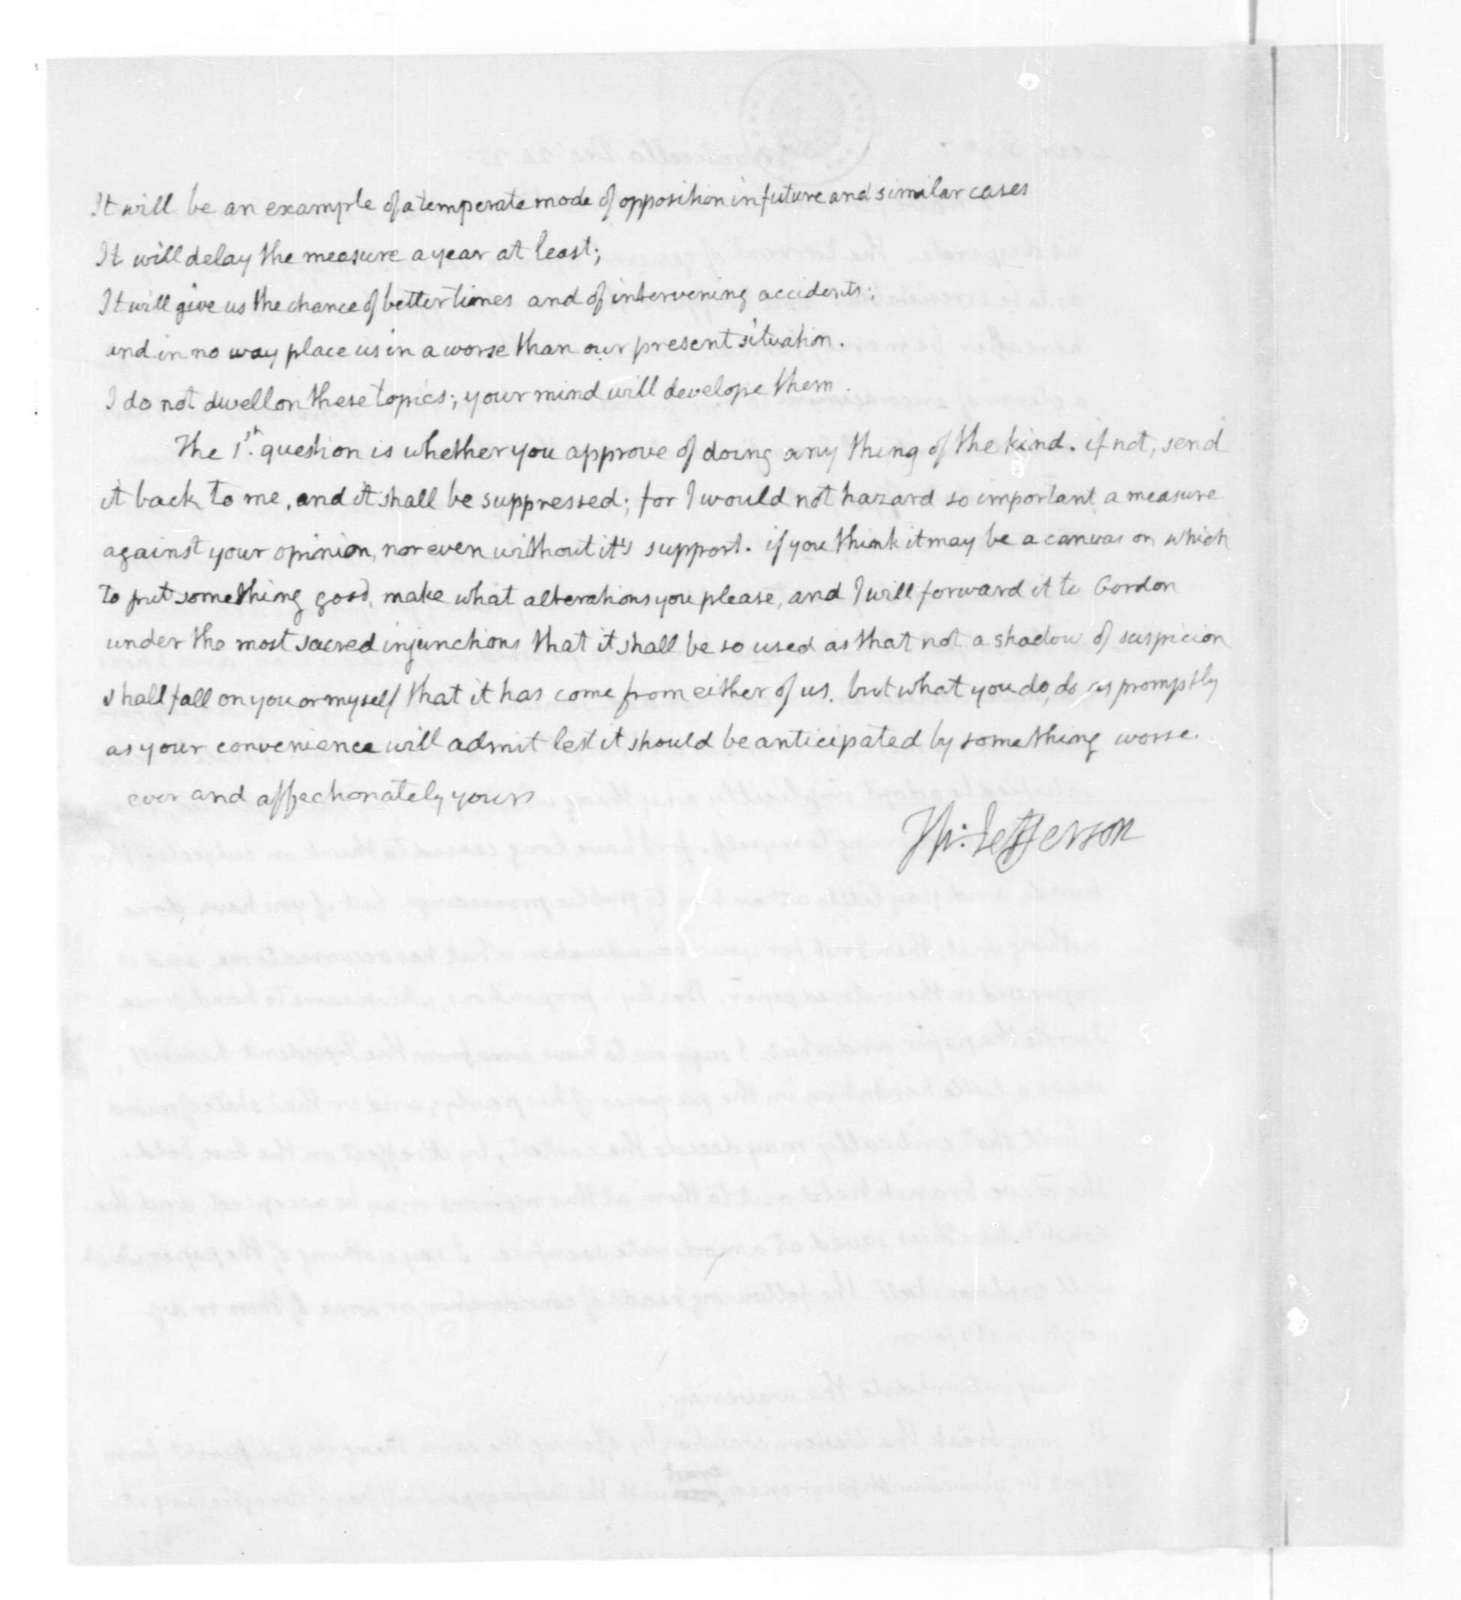 Thomas Jefferson to James Madison, December 24, 1825.